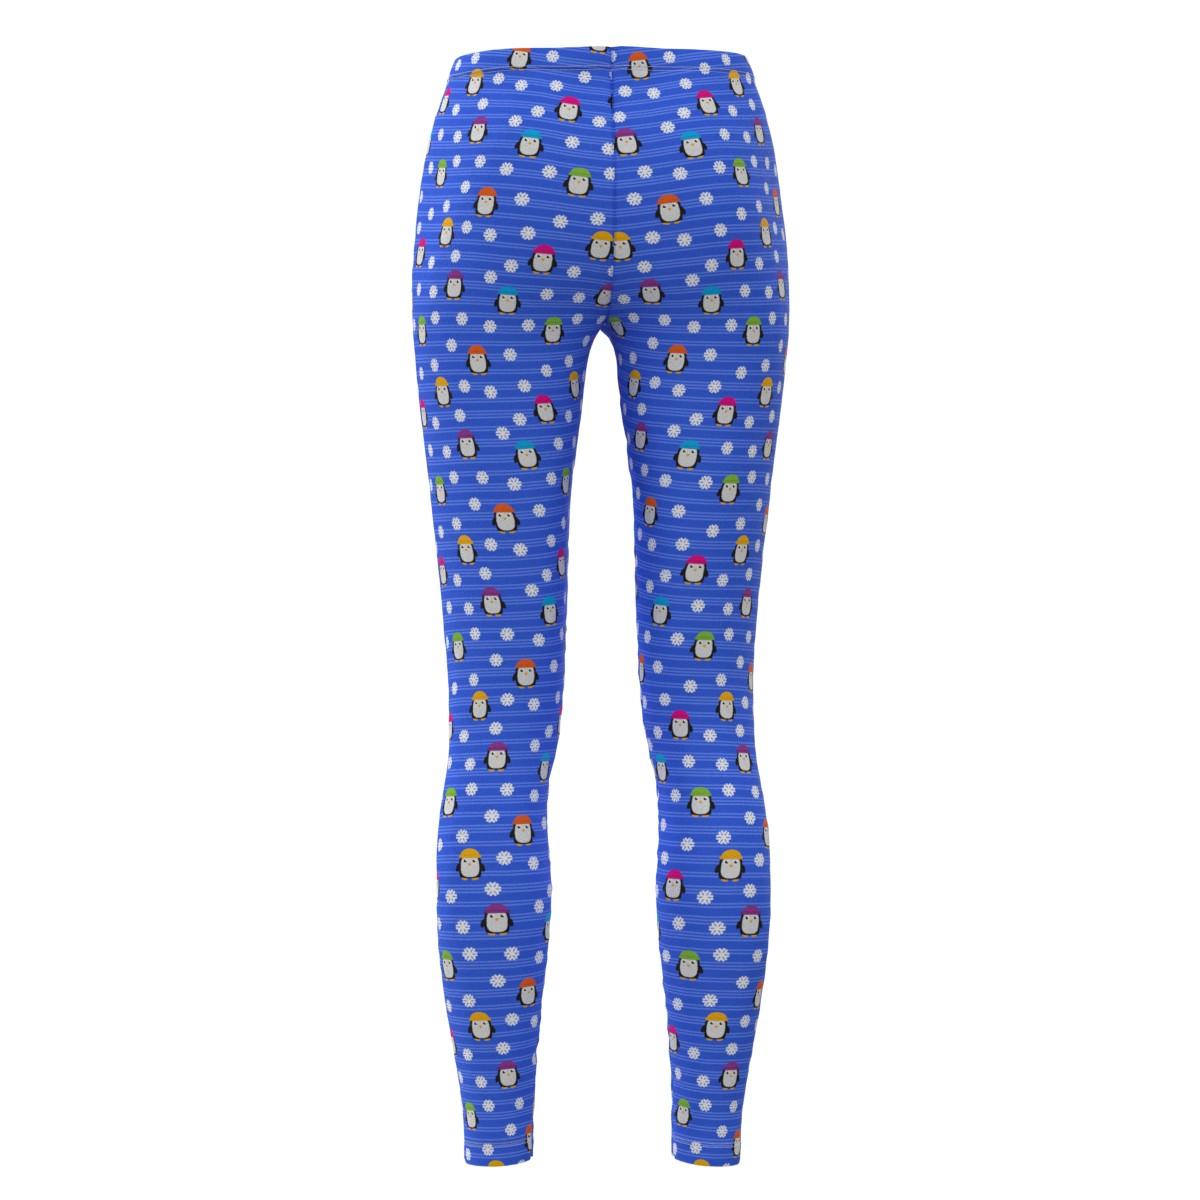 5xl Taglia Plus Leggings Capri Cute Penguins Xs Womens Regular Snowflakes wSHAT1Cq